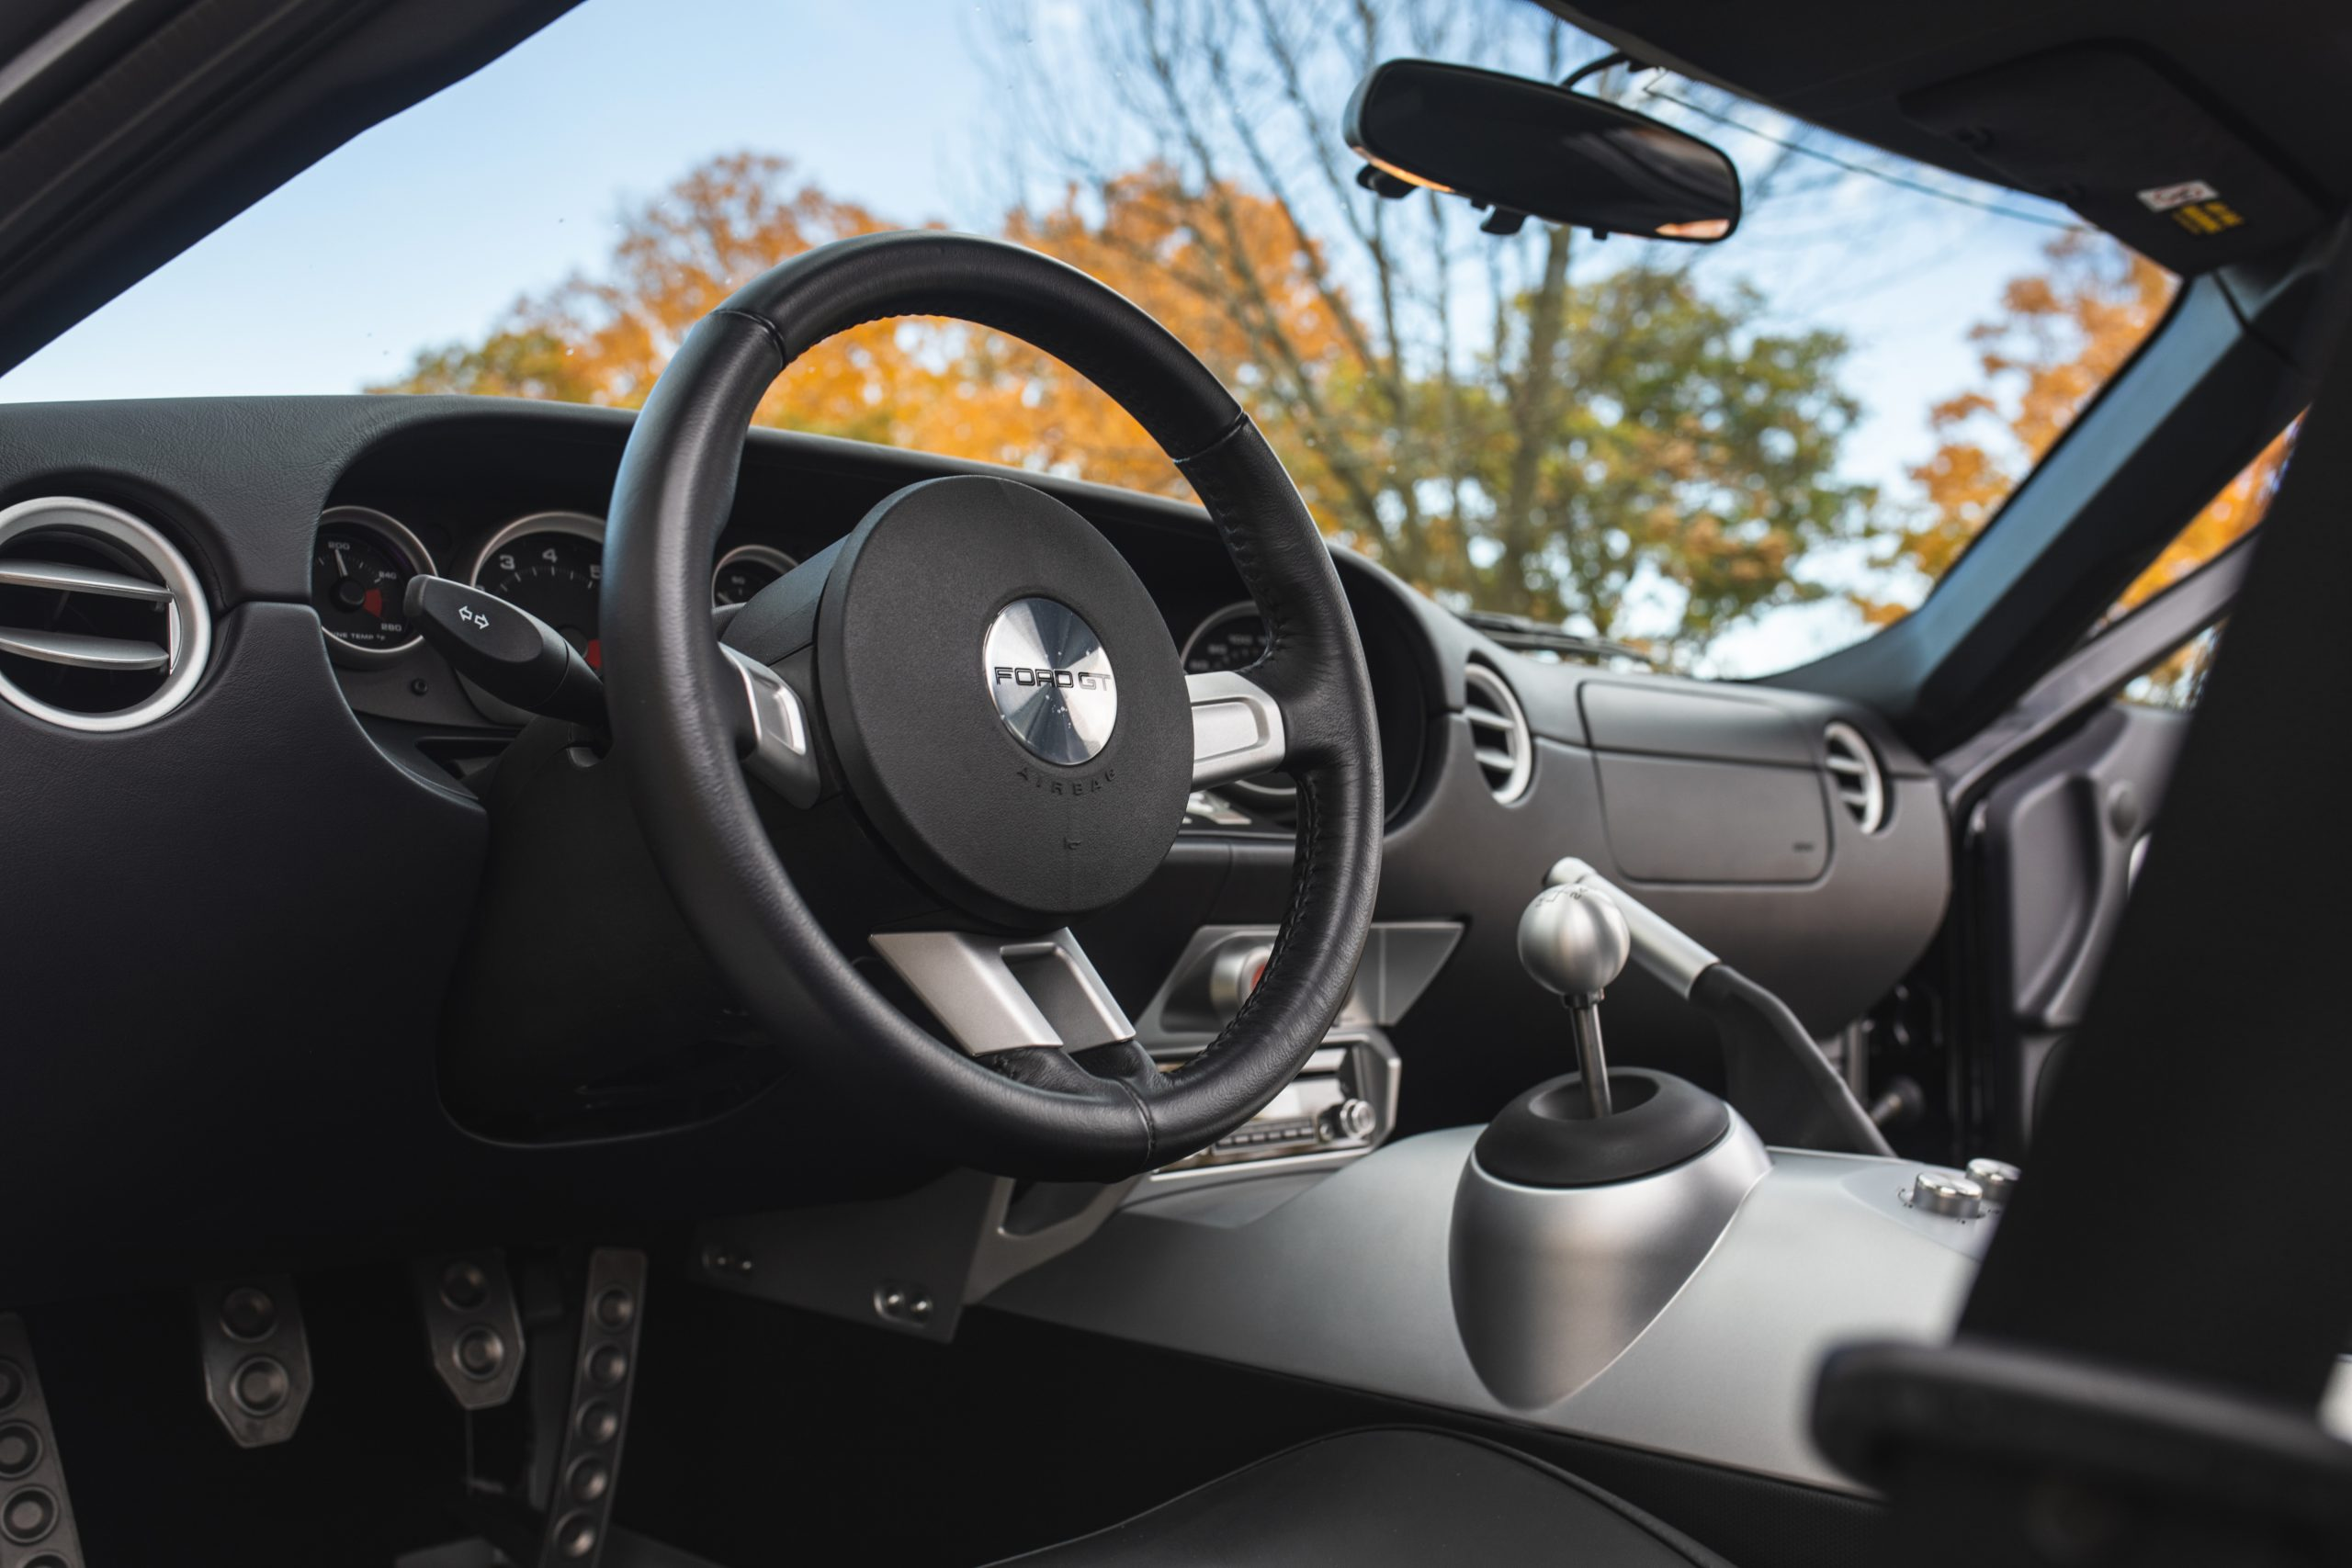 2006 Ford GT interior steering wheel